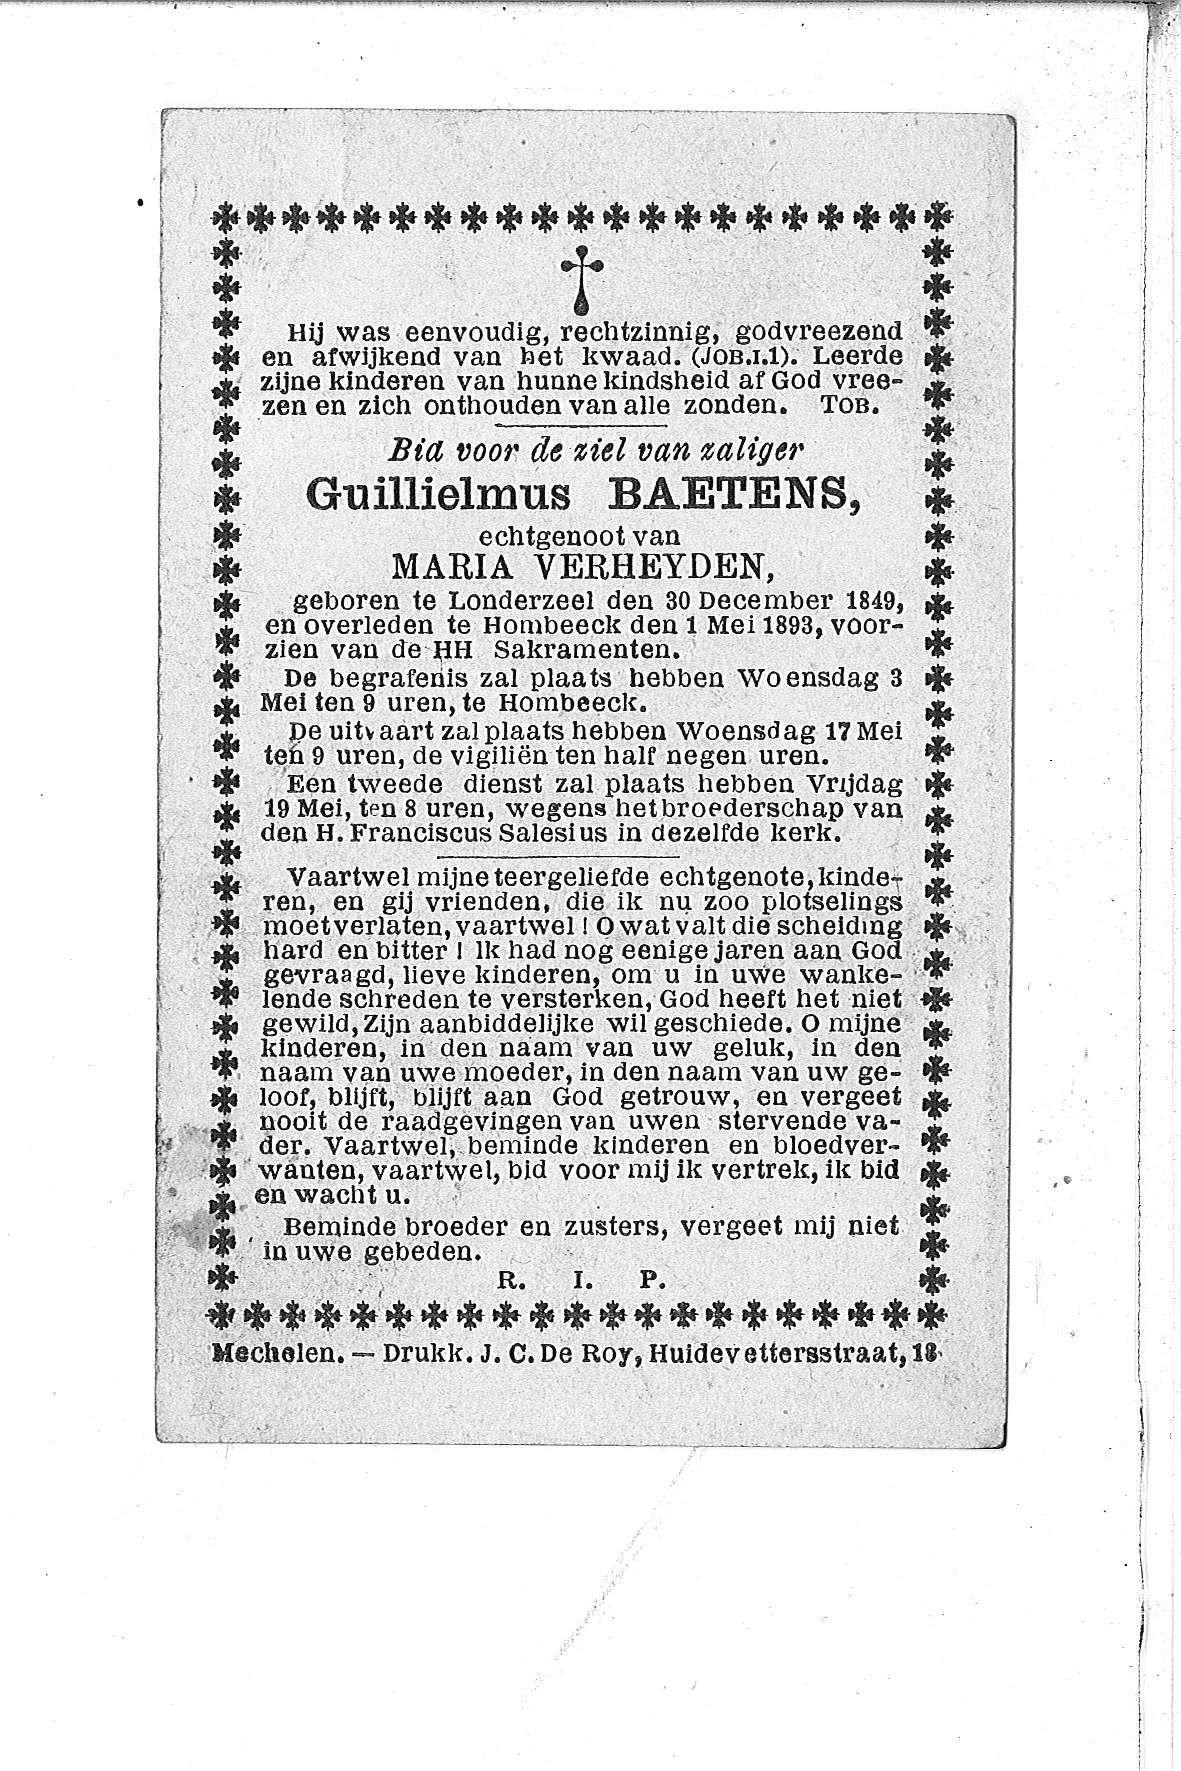 Guillielmus(1893)20101004091156_00001.jpg